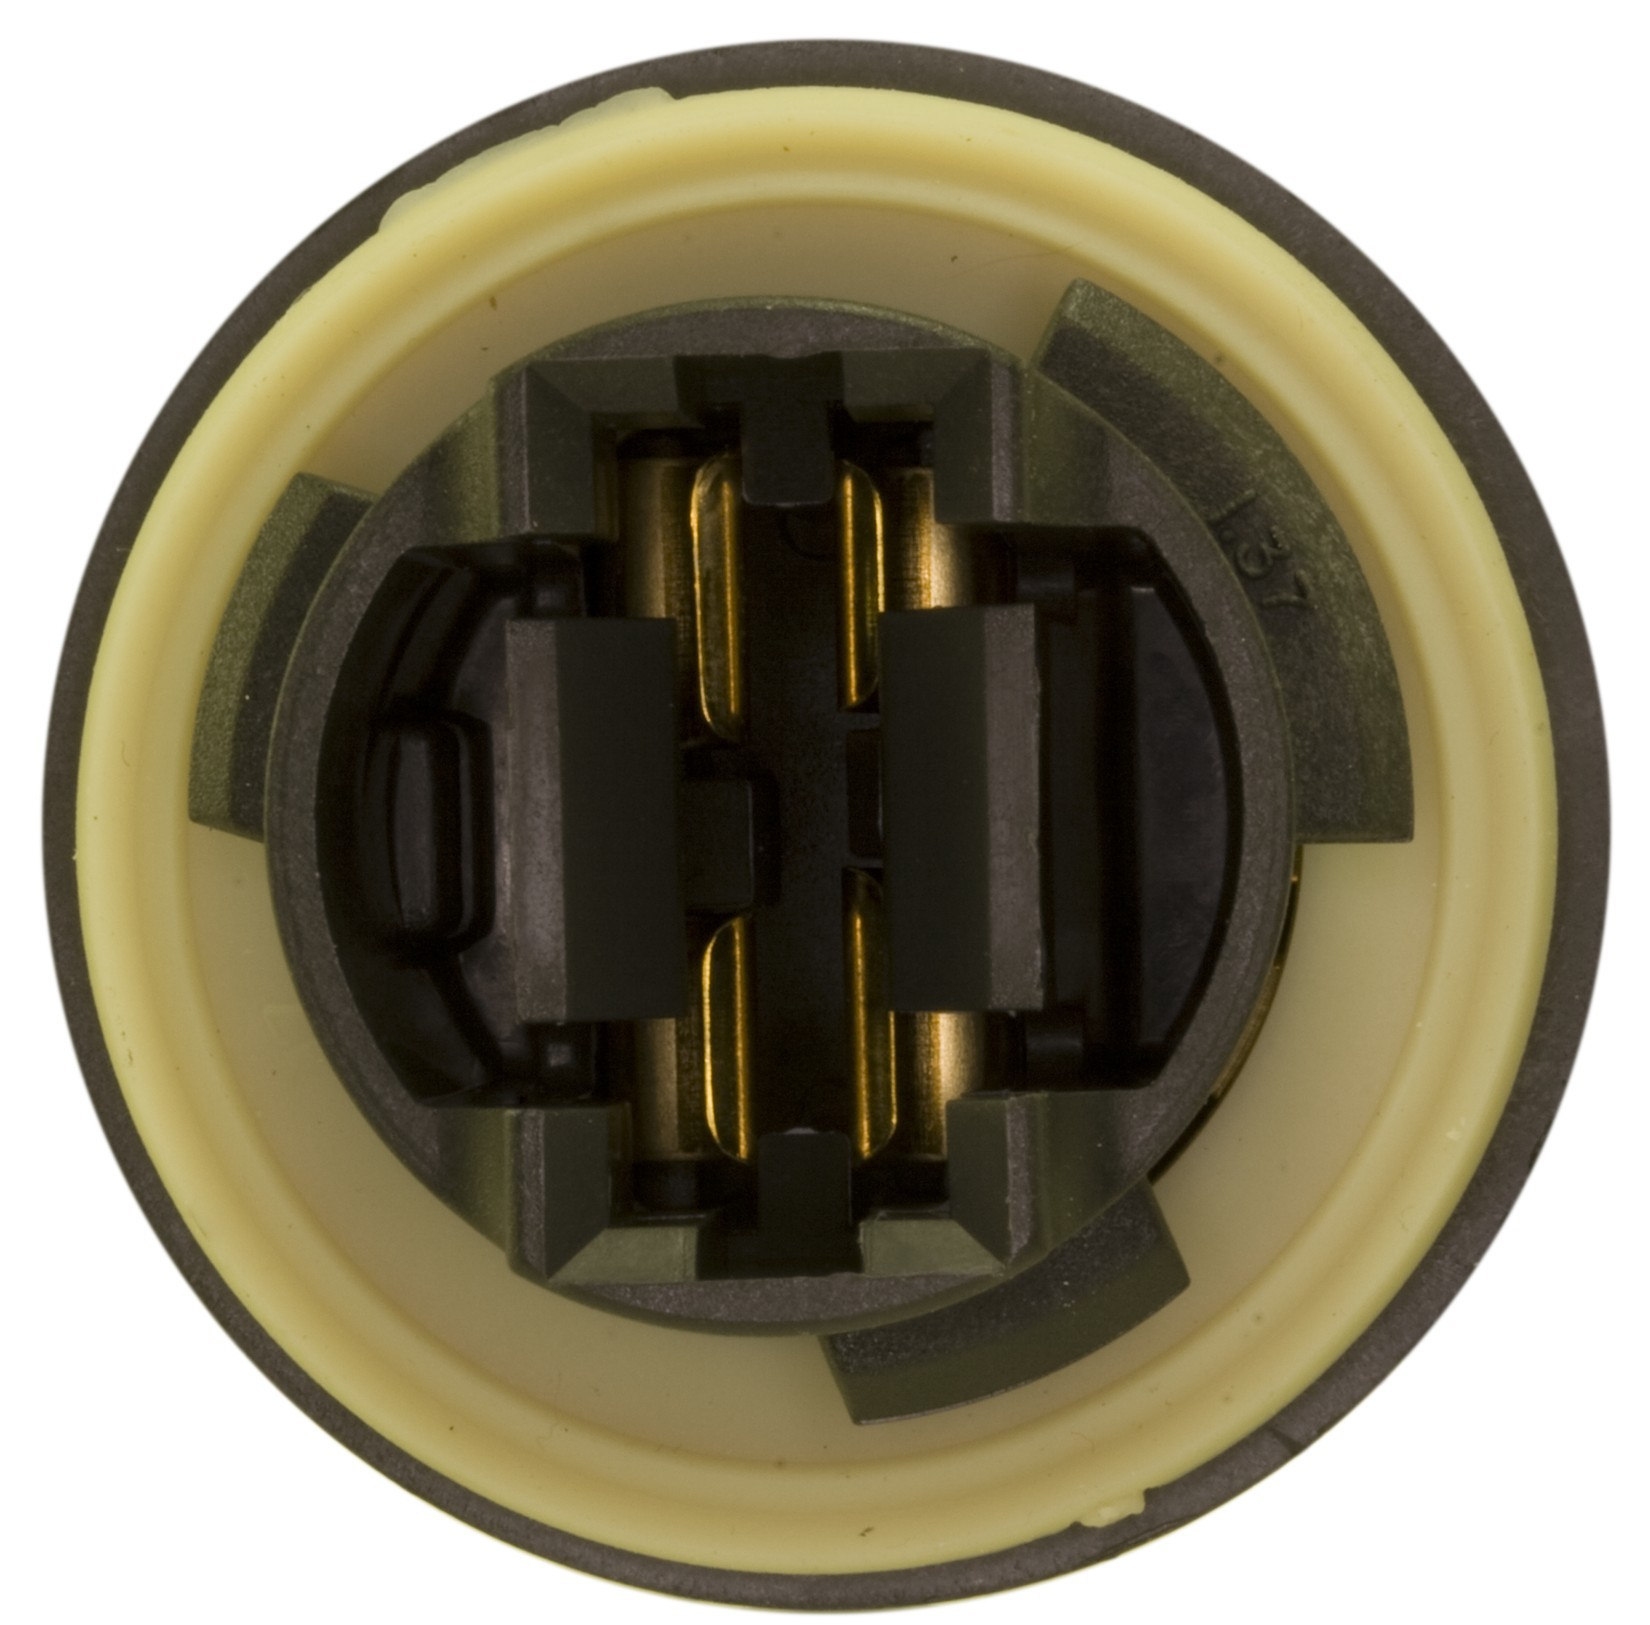 AIRTEX ENG. MGMT. SYSTEMS - Parking Light Bulb Socket - AEM 1P1526